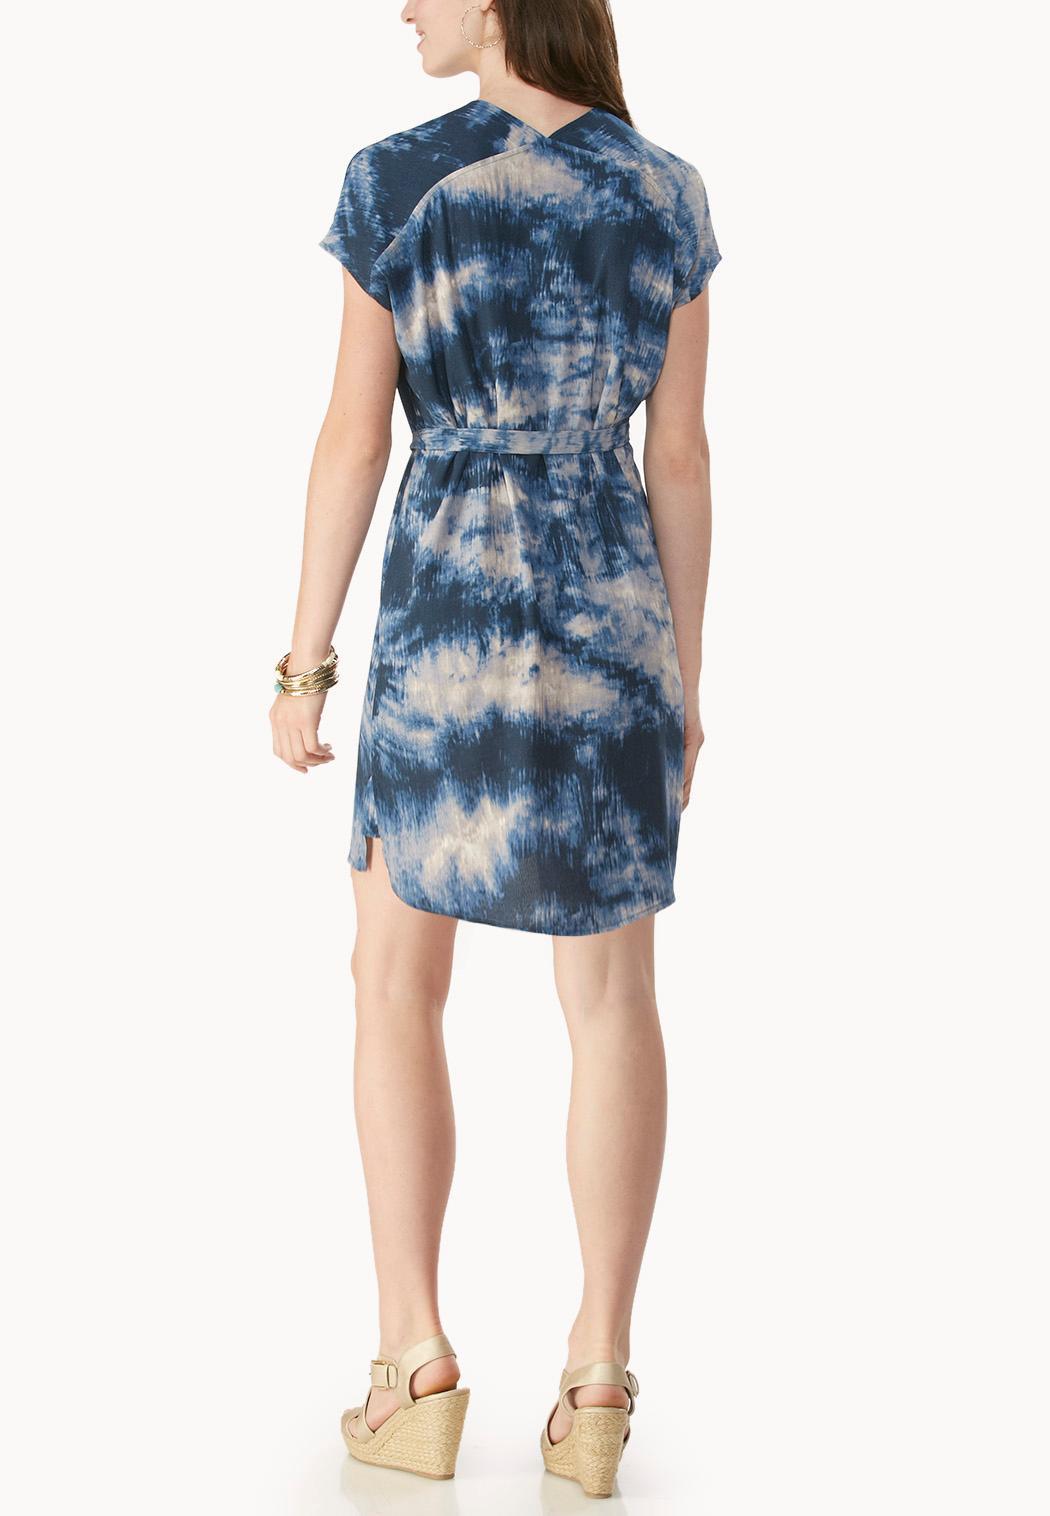 belted tie dye dolman dress plus plus sizes cato fashions